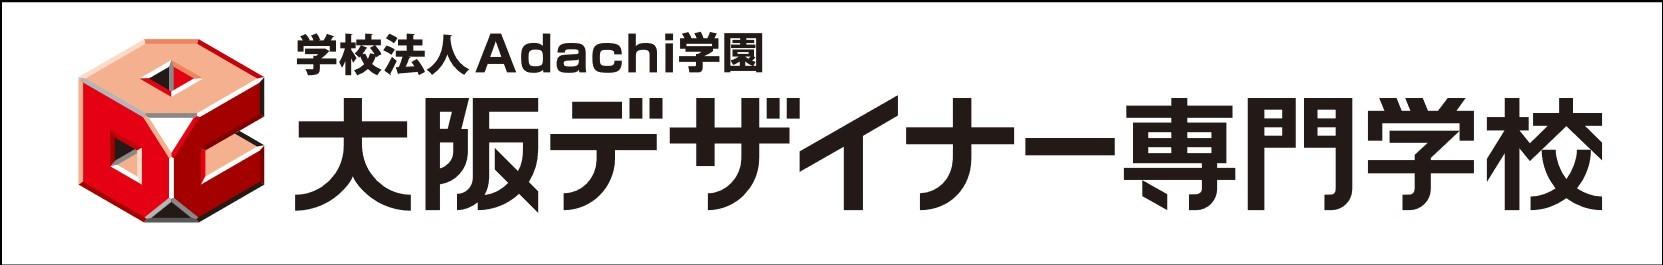 学校法人Adachi学園 大阪デザイナー専門学校大阪デザイナー